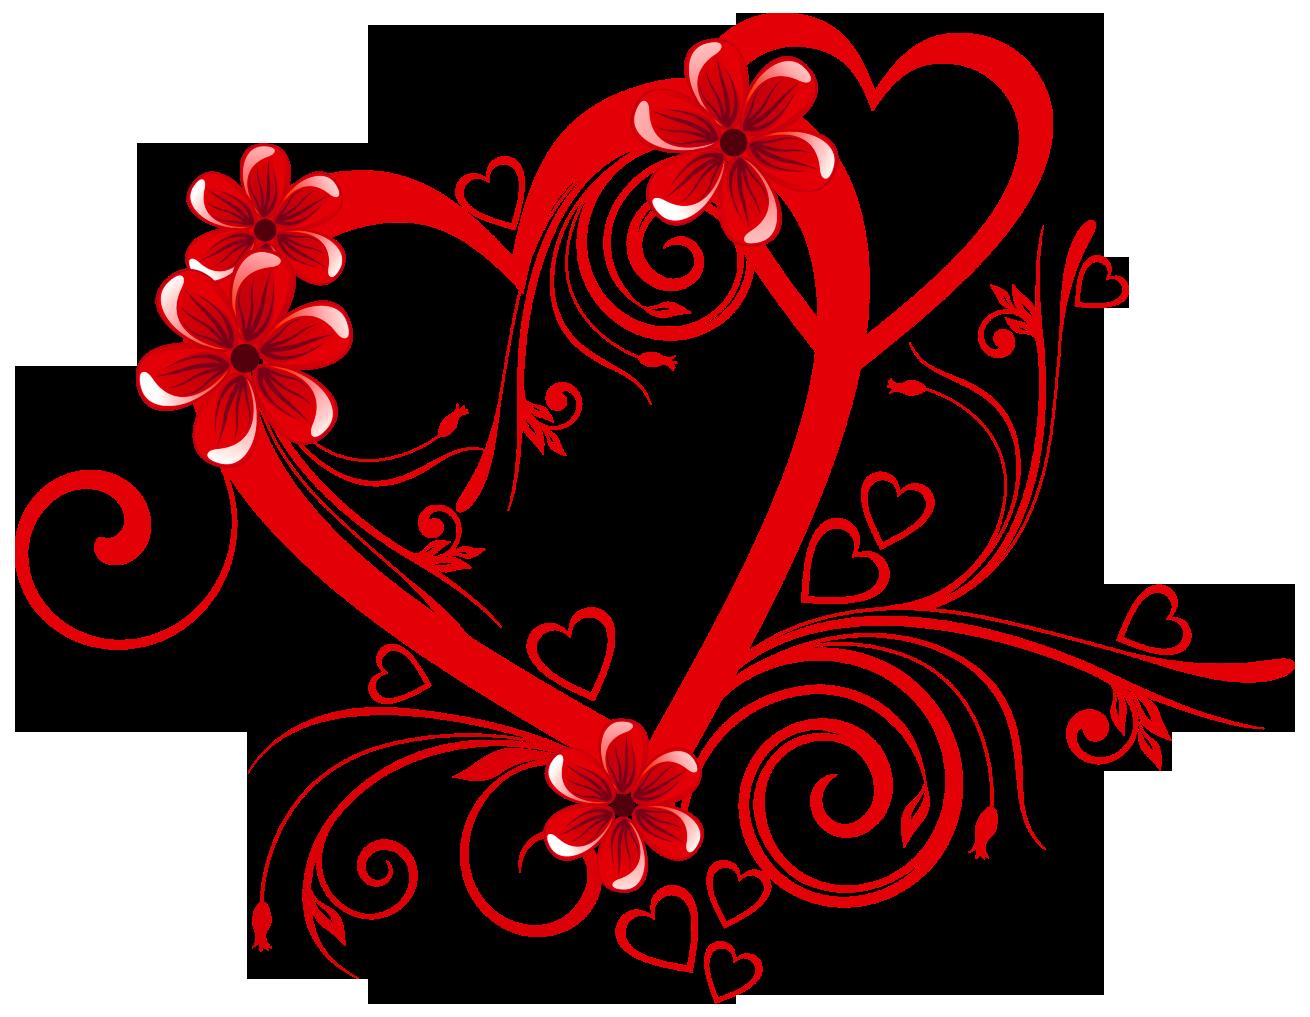 Love flowers clipart.